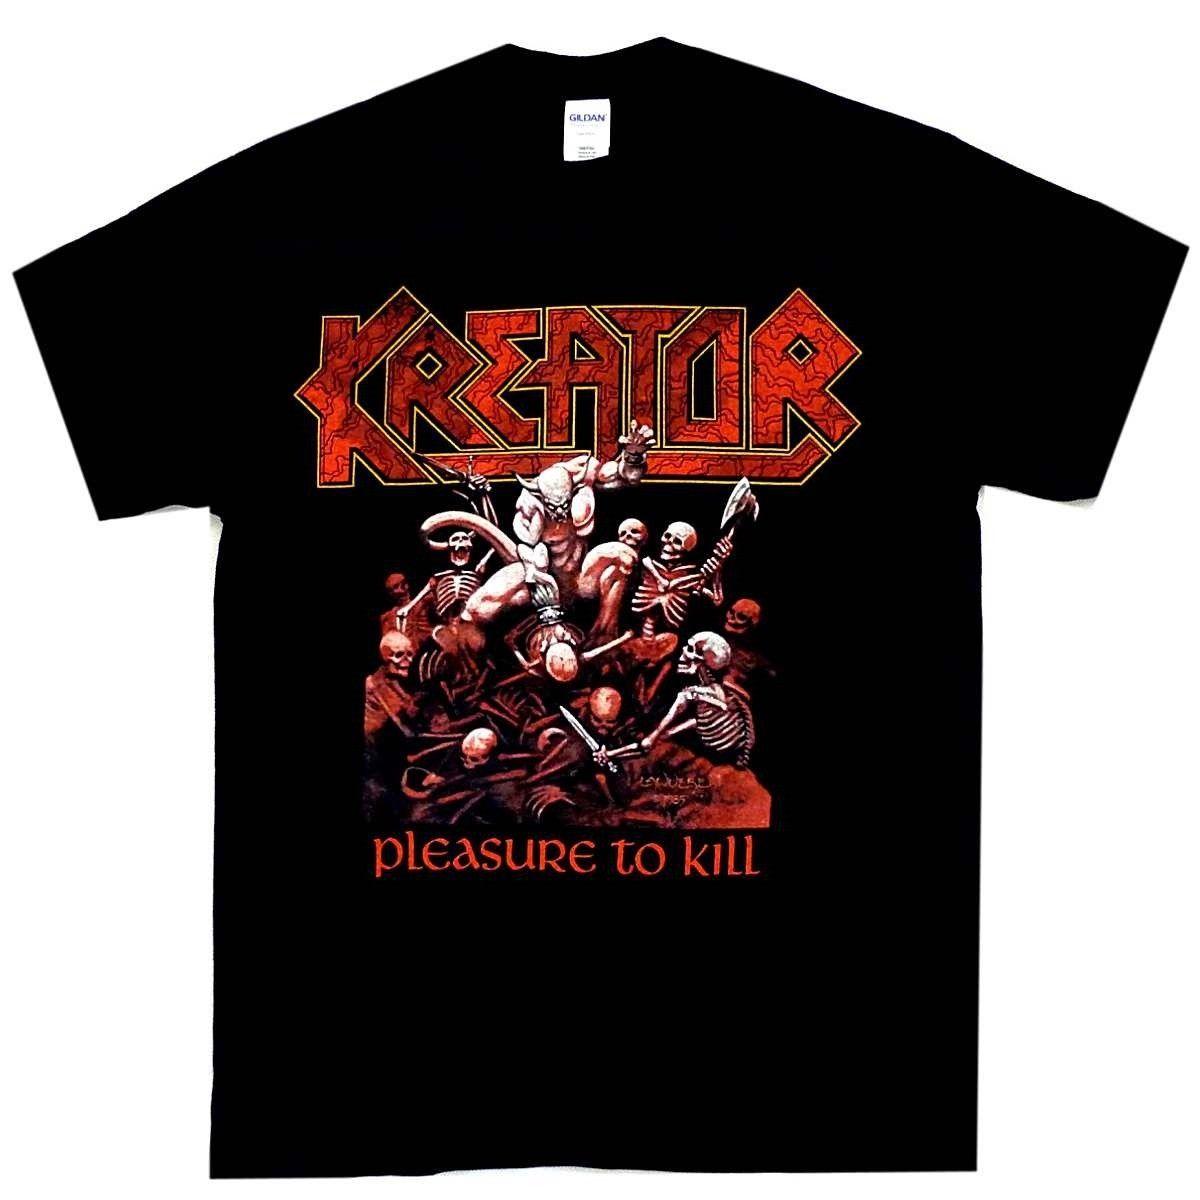 Kreator Pleasure To Kill Shirt S-3XL Official T-shirt Thrash Metal T New Sleeves Boy Cotton Men Plus Size Top Tee